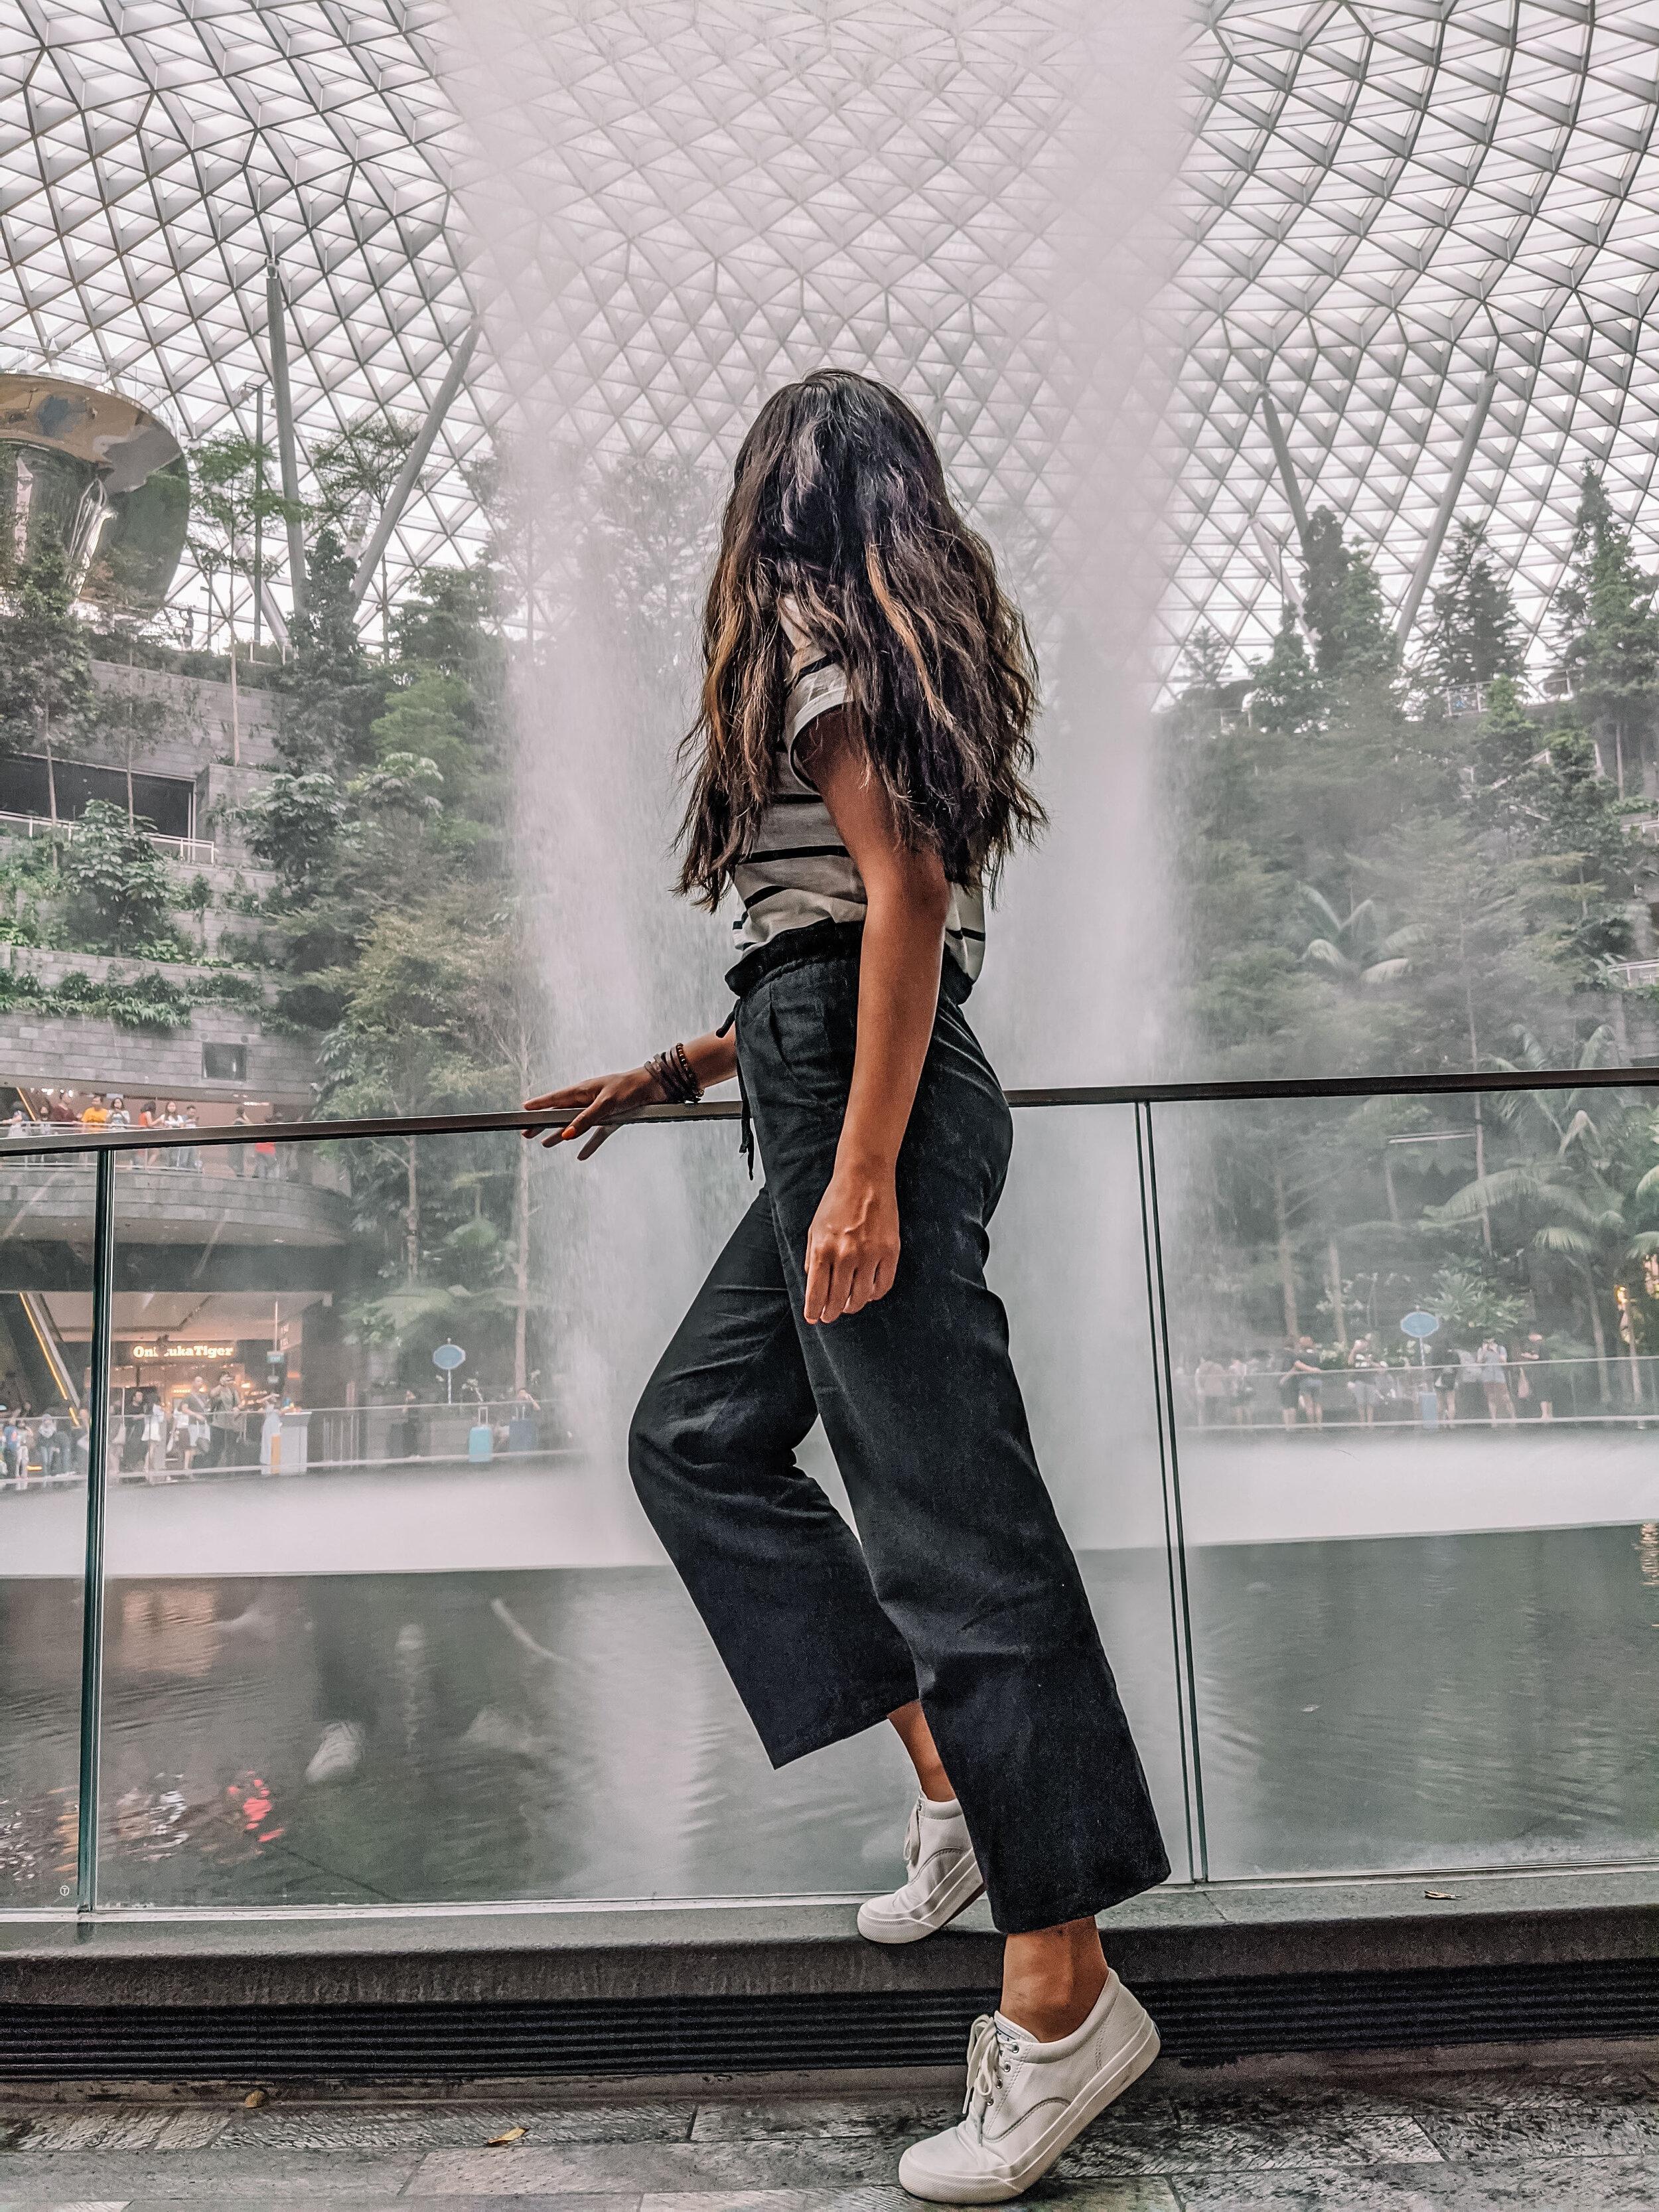 Rachel Off Duty: Rachel at Jewel Changi Airport